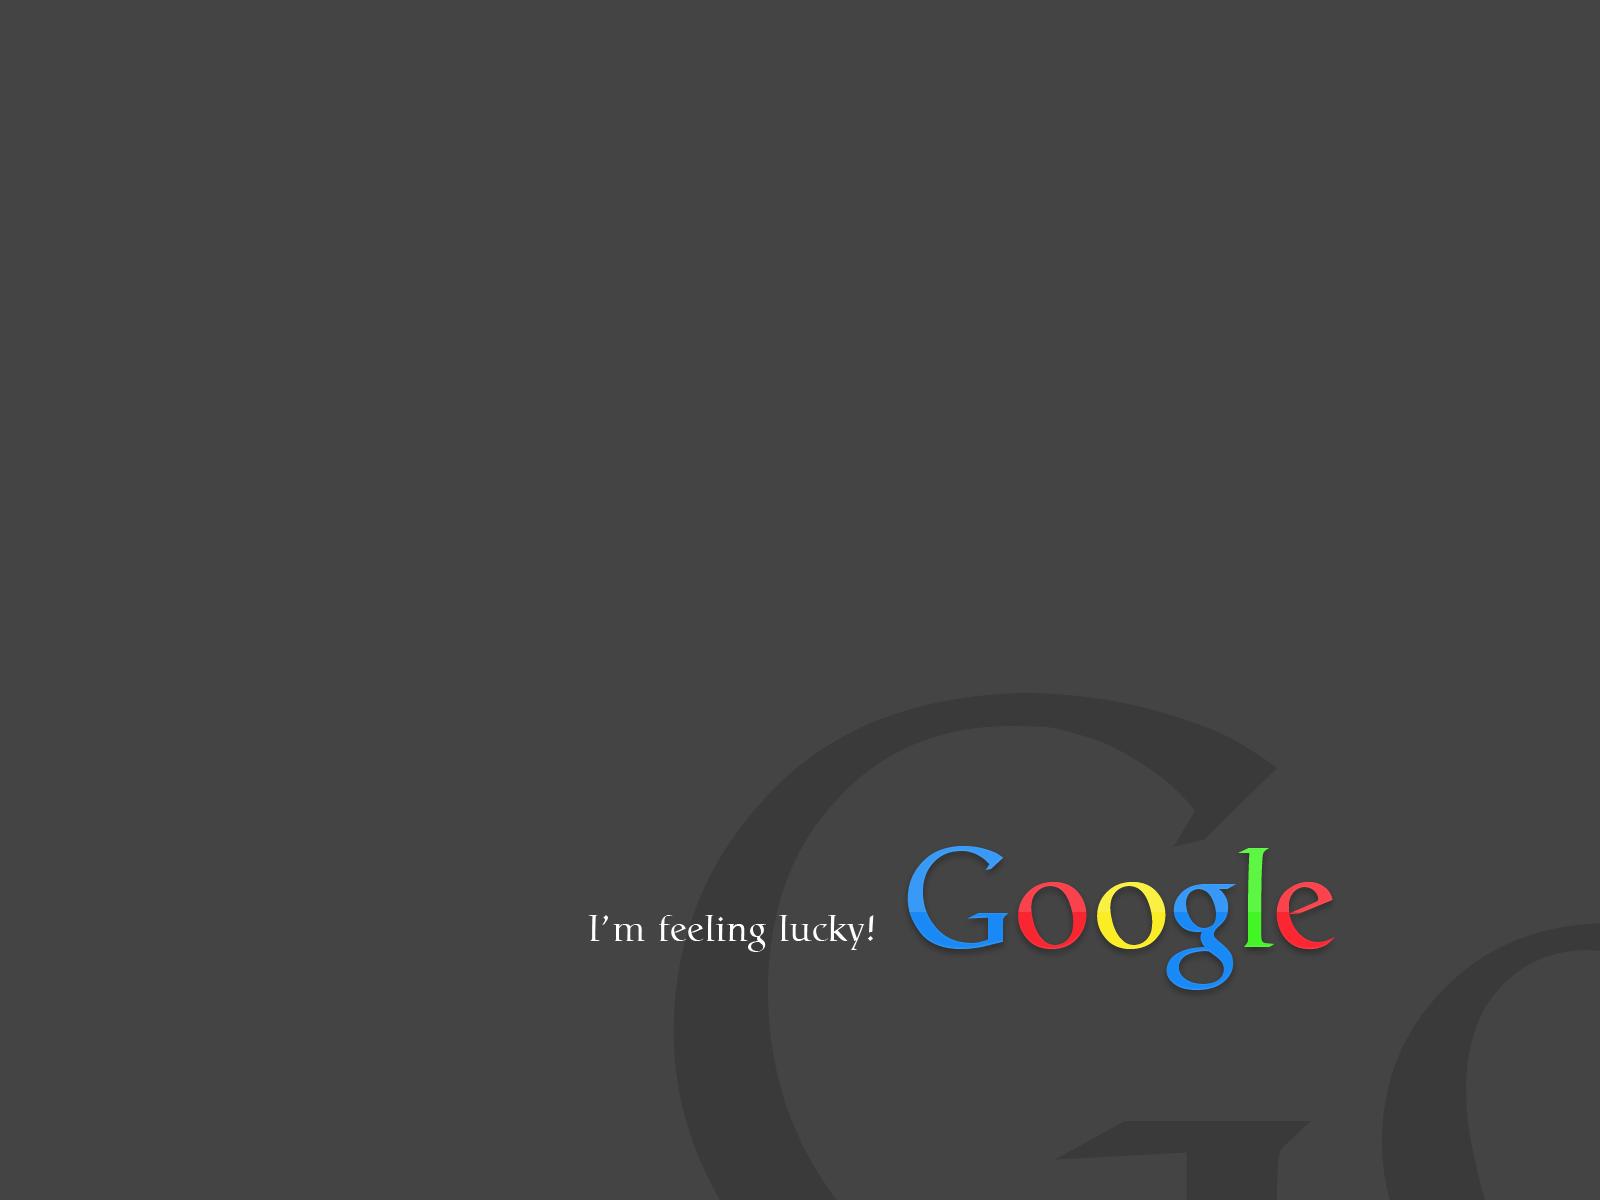 Hd Google Wallpapers - wallpaper hd